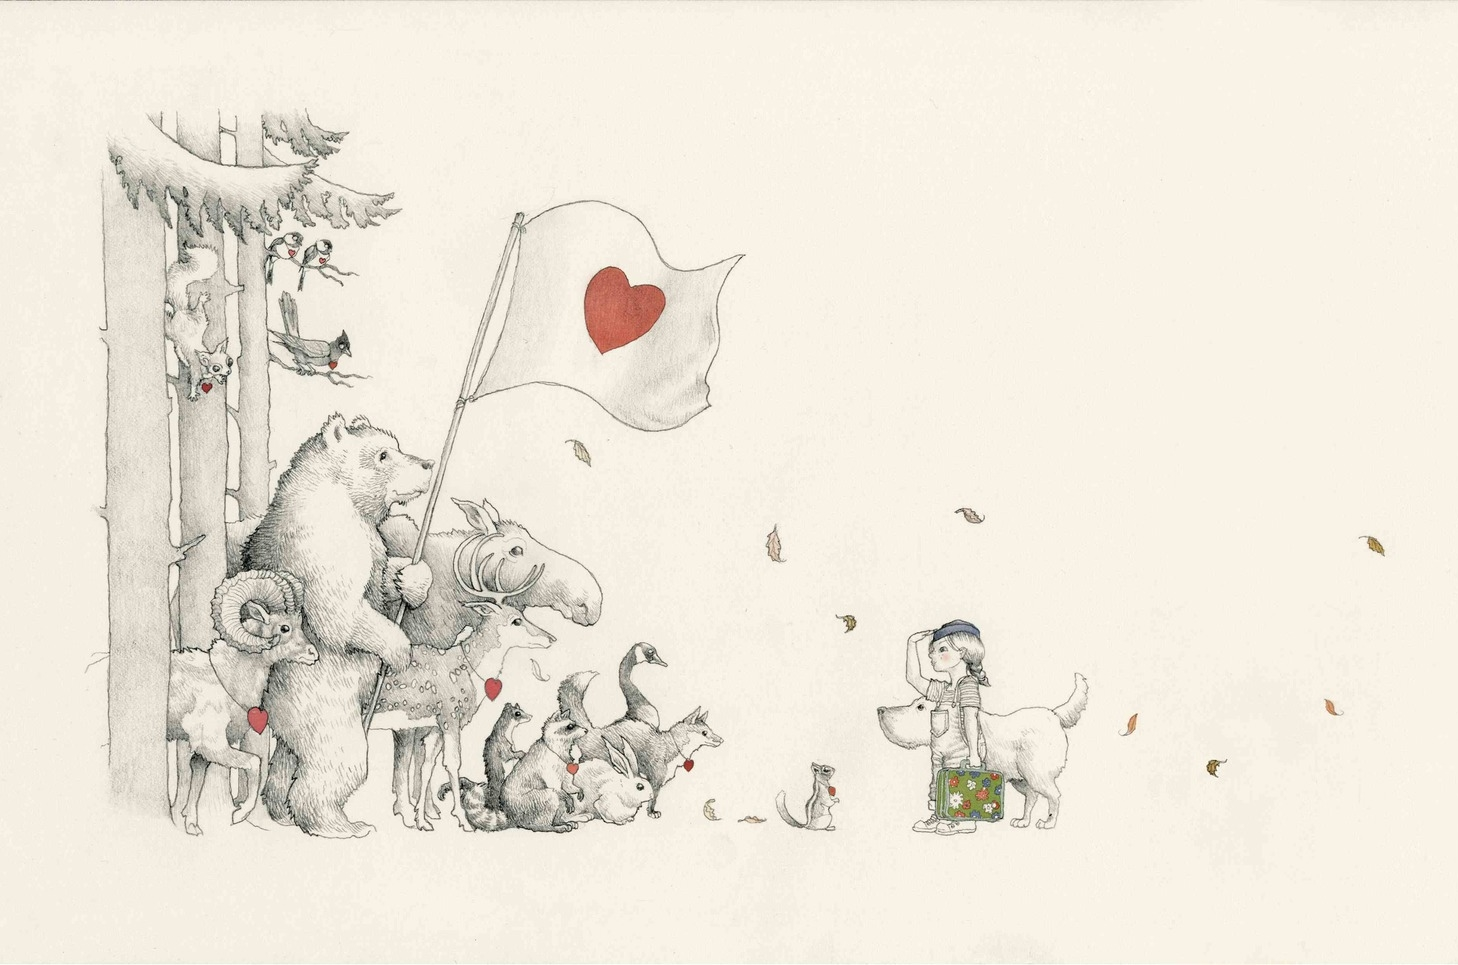 Army of hearts 4.jpg